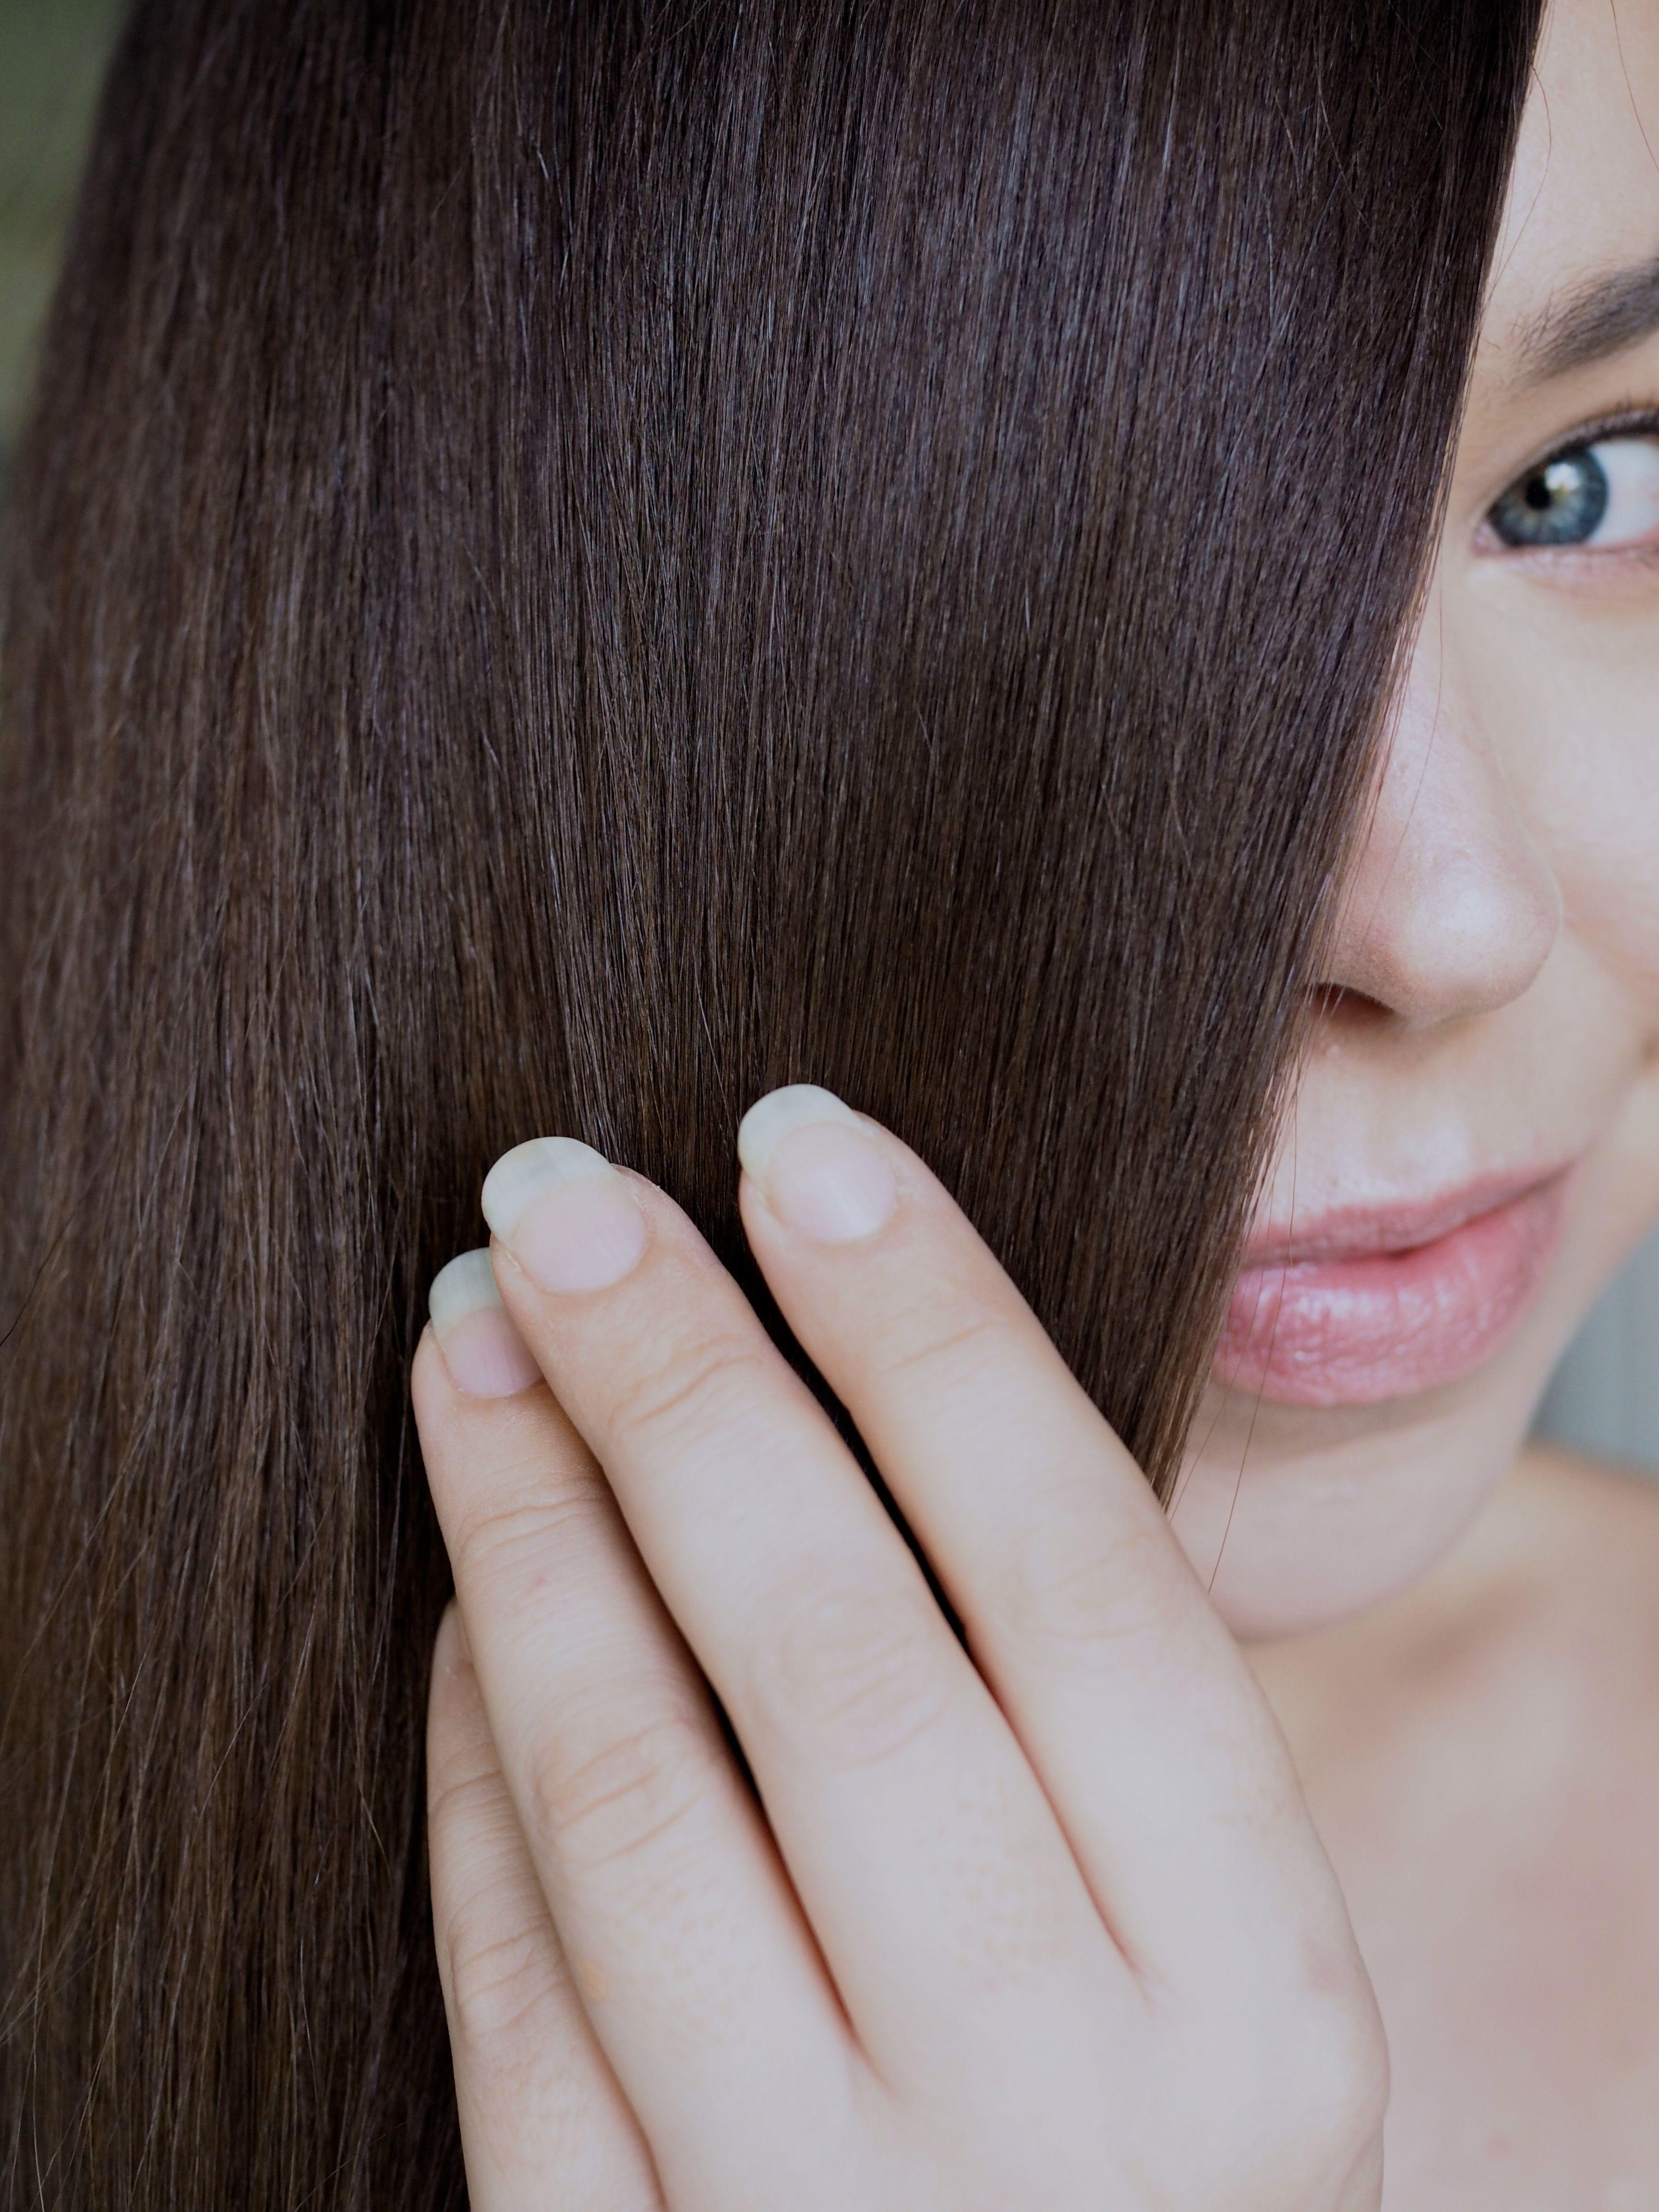 iho hiukset kynnet